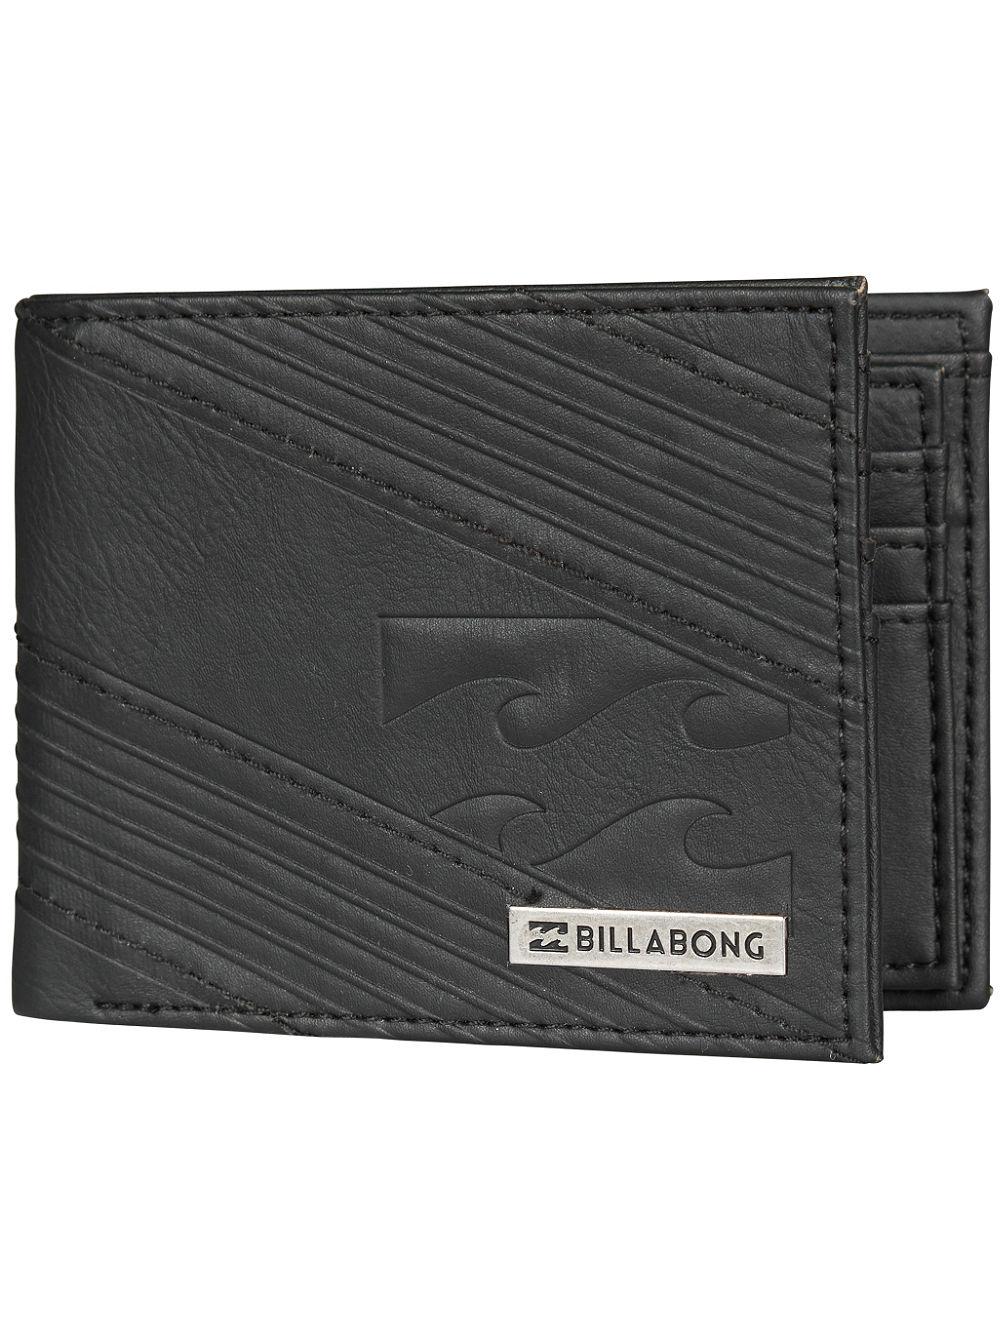 billabong-junction-wallet